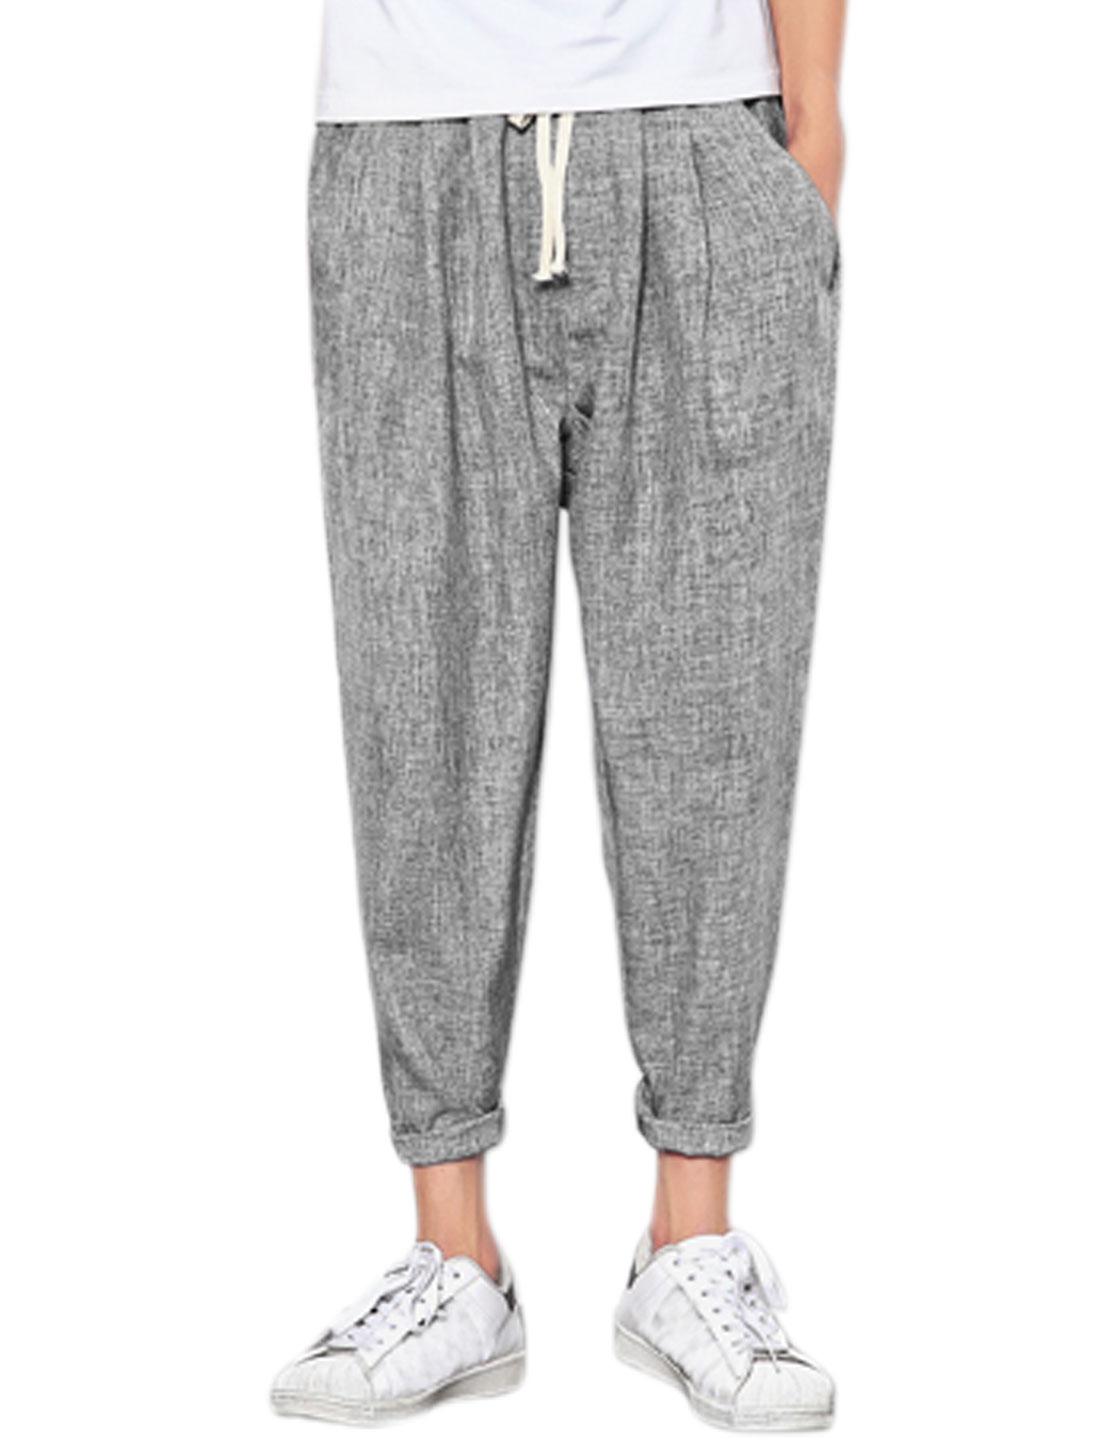 Men Drawstring Elastic Waist Pockets Tappered Cropped Pants Gray W30